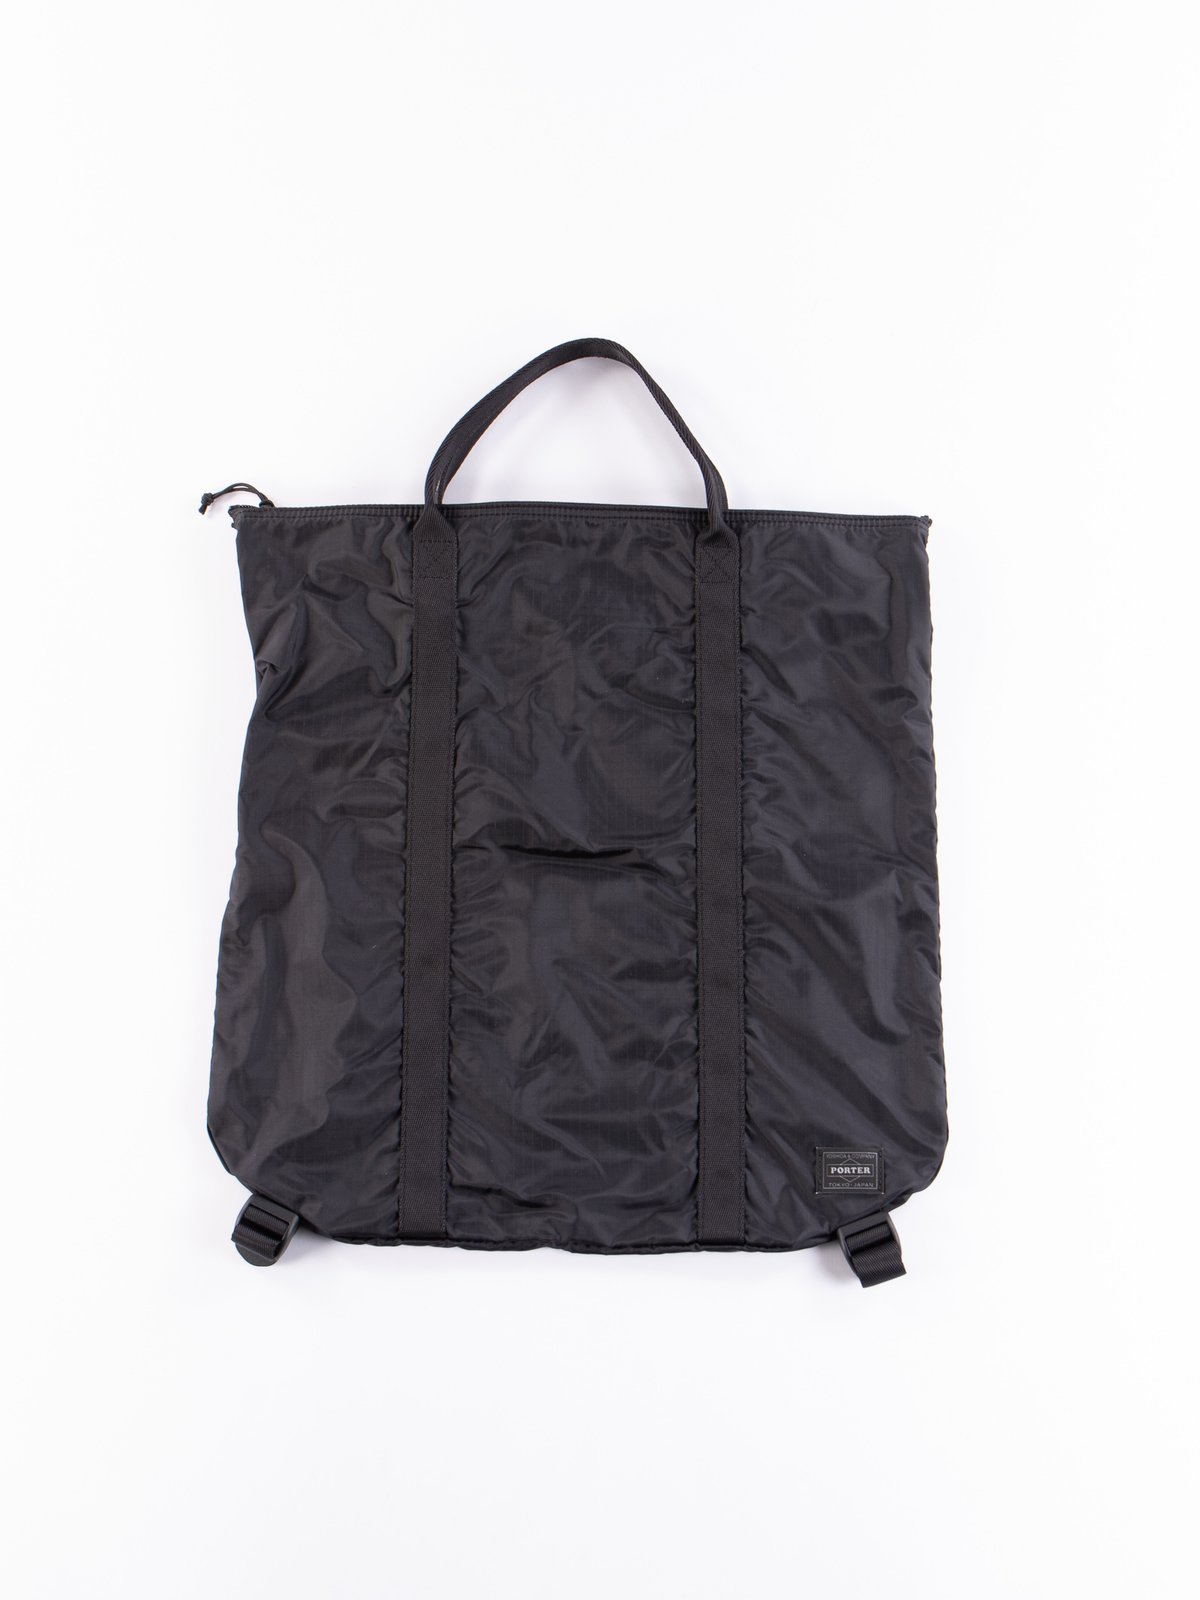 Black Flex 2Way Tote Bag - Image 1